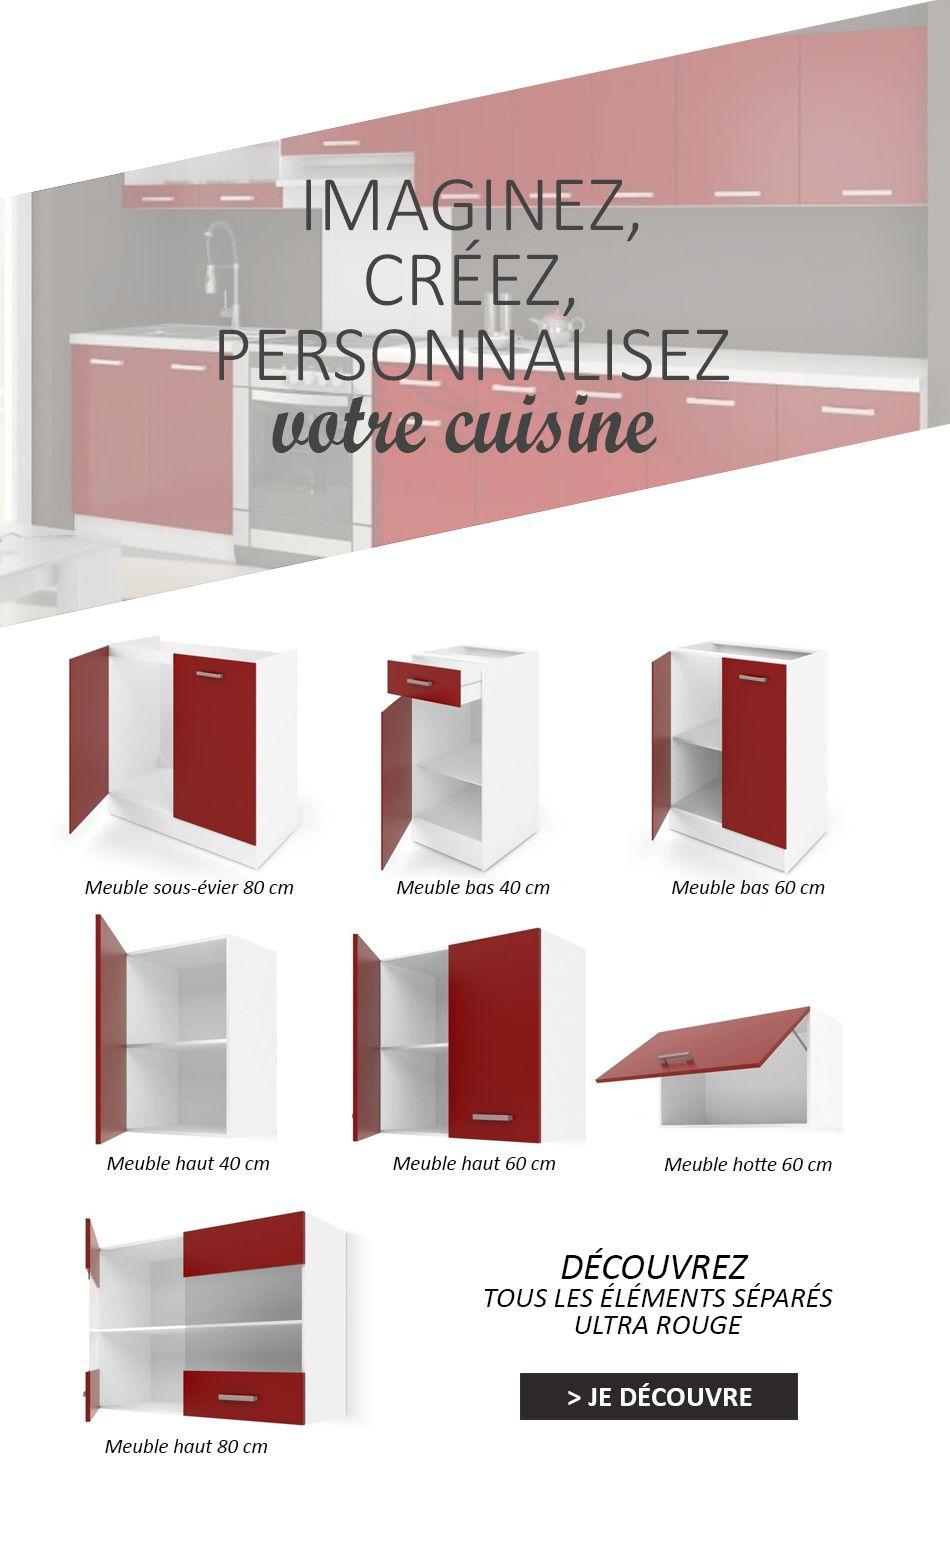 Meuble bas profondeur 40 cm amazing charming meuble bas cuisine cm profondeur with meuble bas - Meuble bas cuisine profondeur 40 cm ...